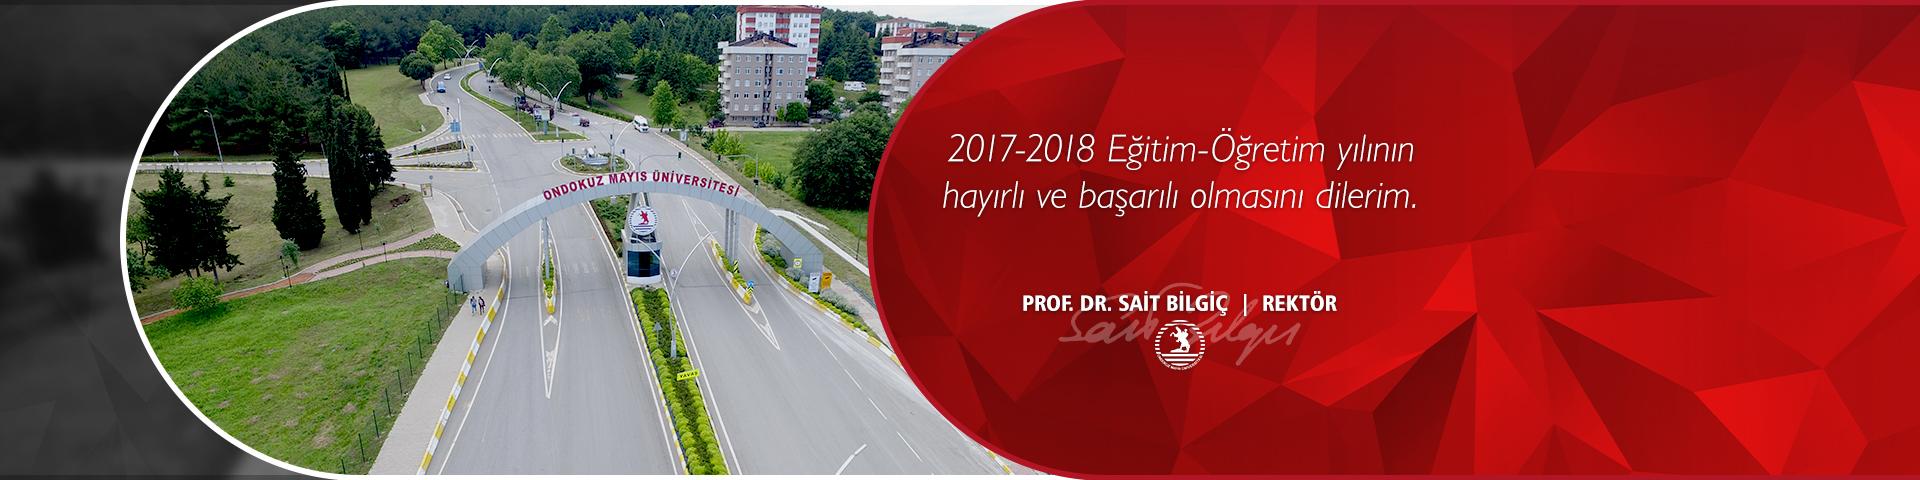 http://www.omu.edu.tr/sites/default/files/files/quotyeni_egitim-ogretim_yilinin_hayirli_ve_basarili_olmasini_diliyorumquot/2017-2018acilis-sliderz.jpg